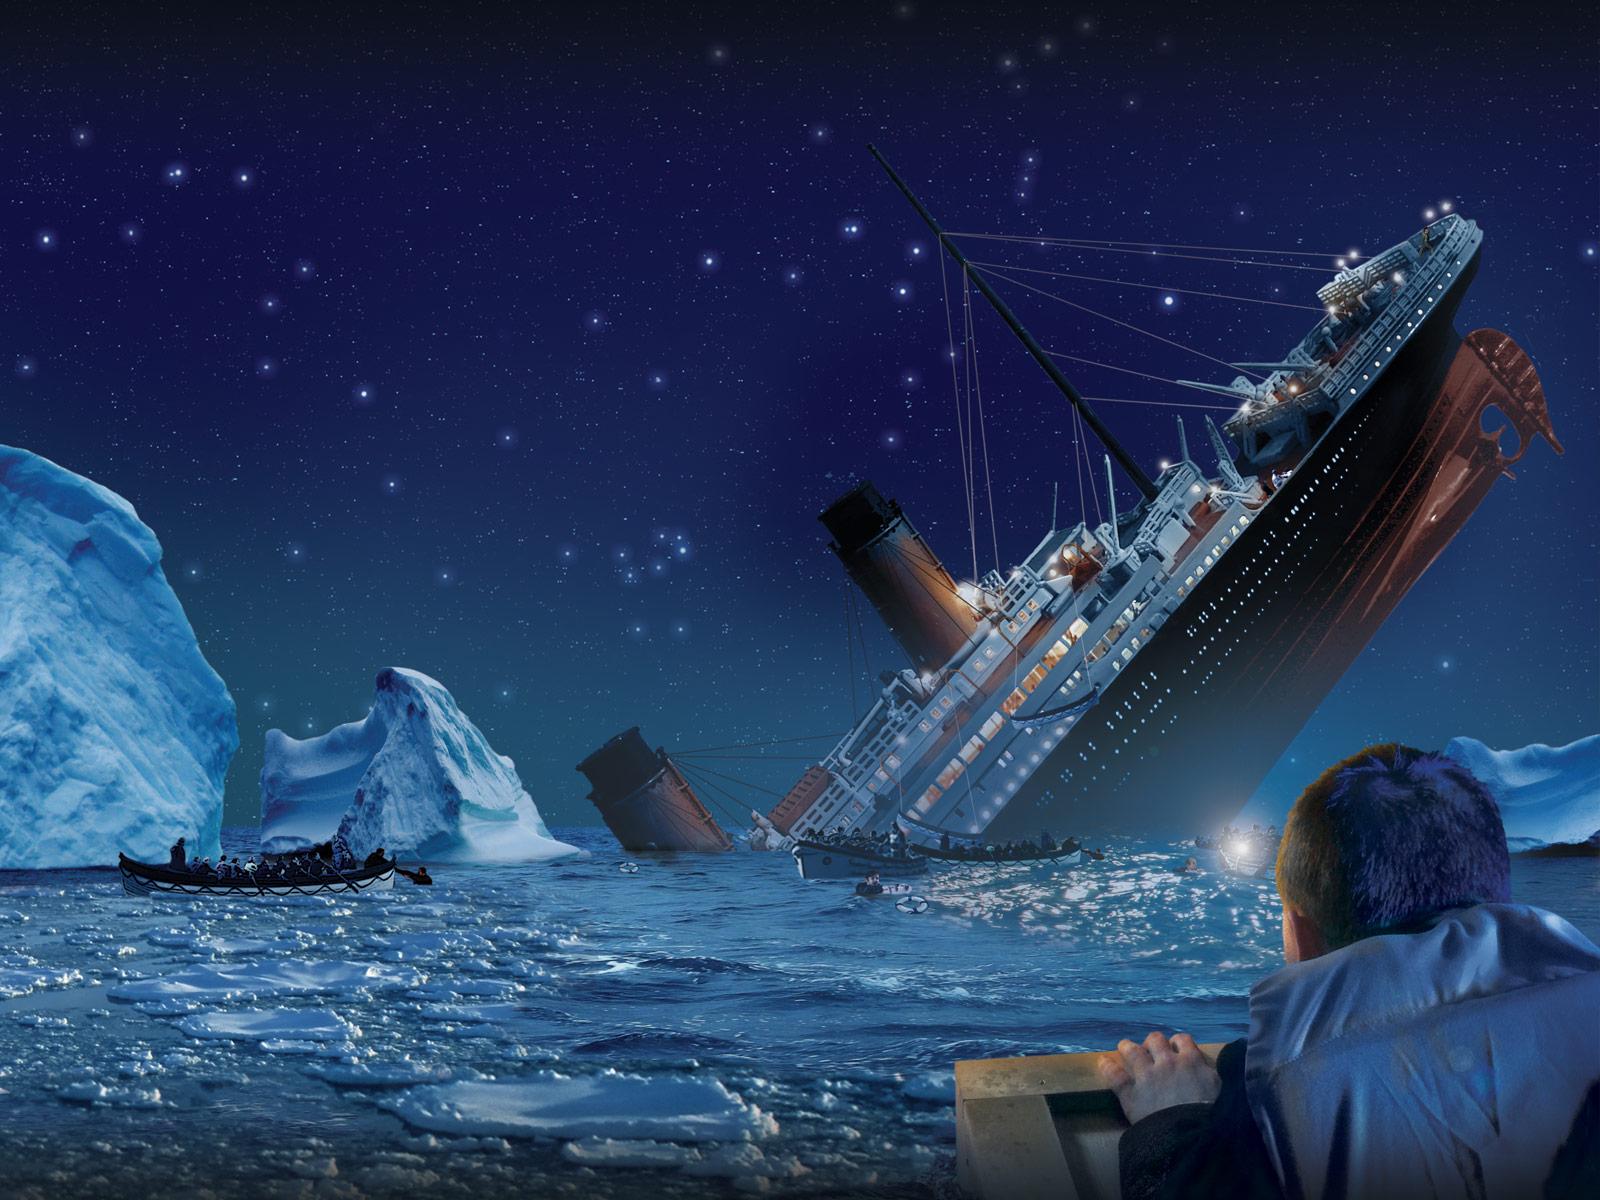 The-Titanic-wallpaper-wp429845